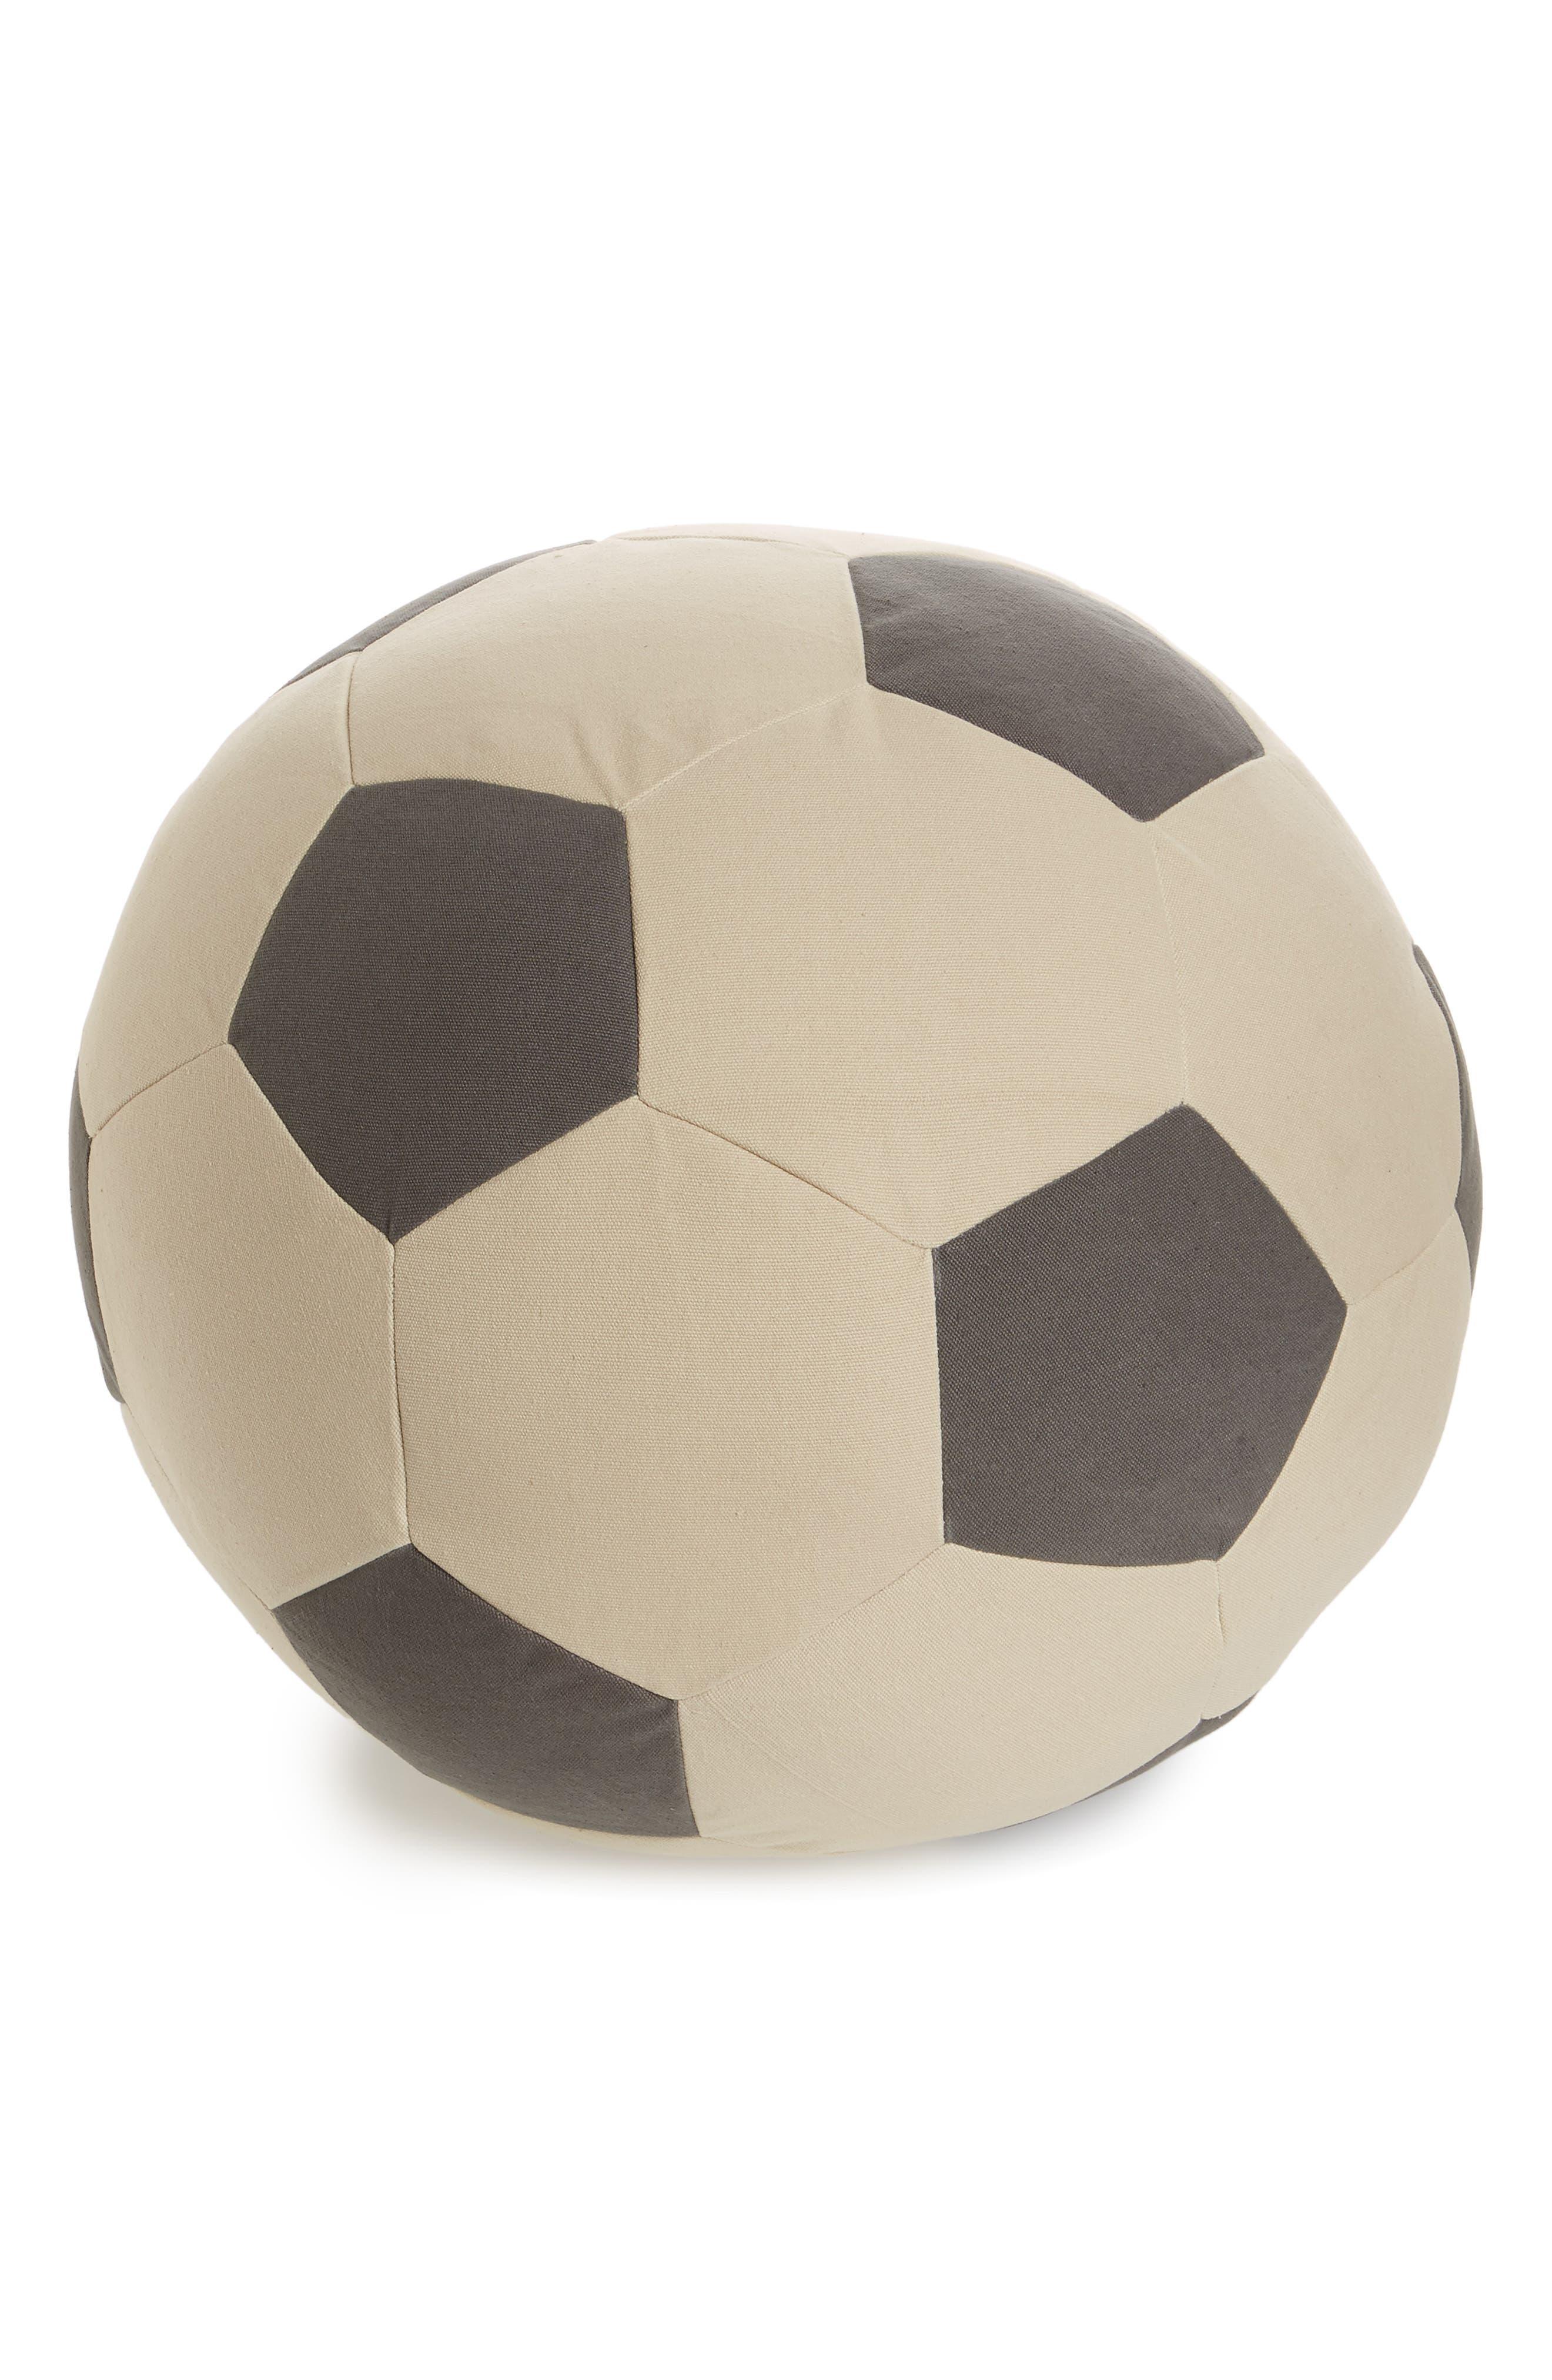 Soccer Pouf,                             Main thumbnail 1, color,                             Black